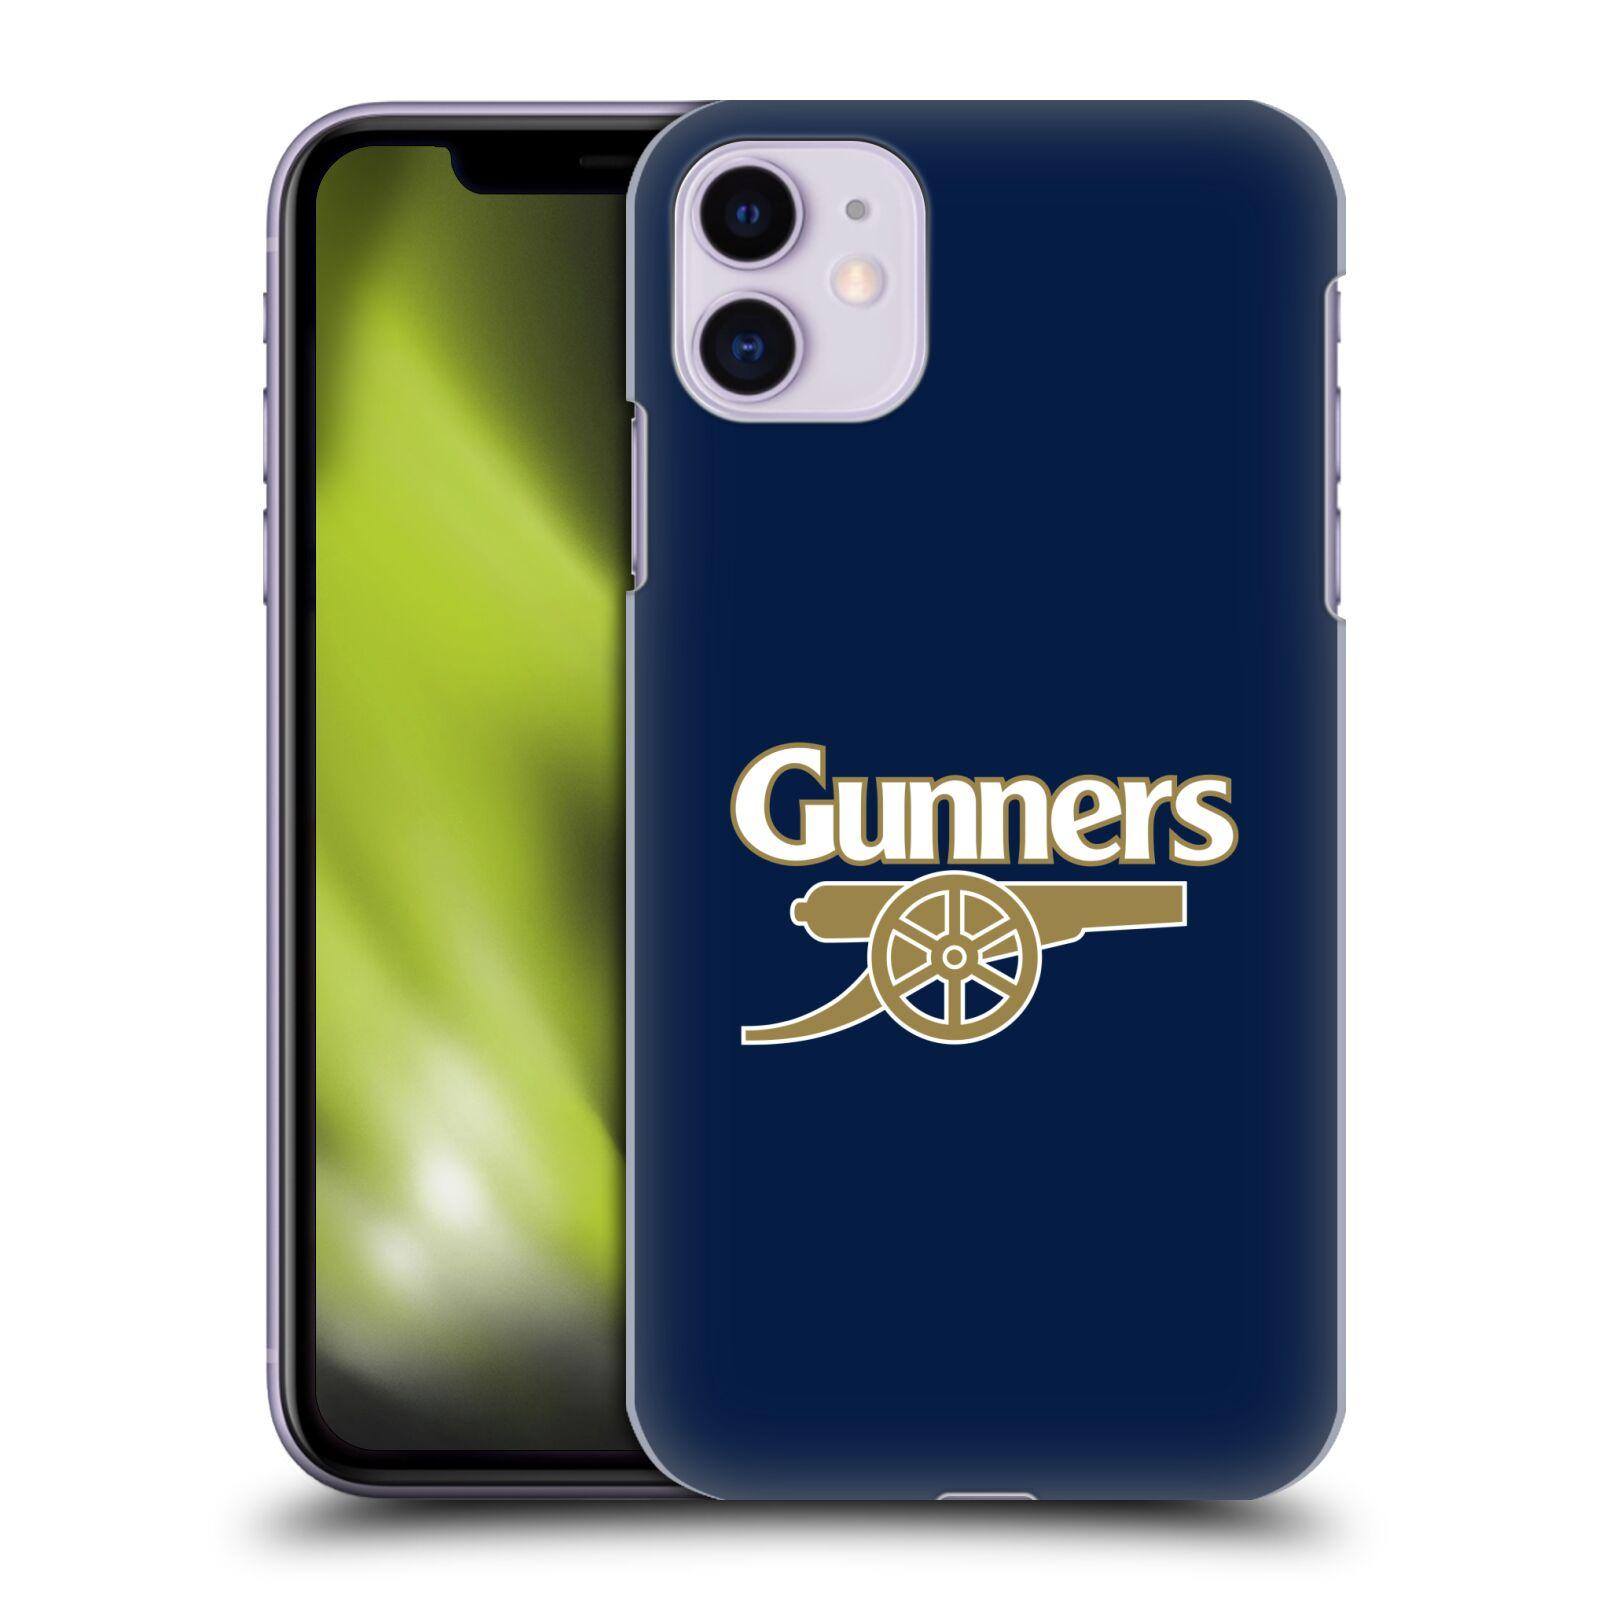 Plastové pouzdro na mobil Apple iPhone 11 - Head Case - Arsenal FC - Gunners